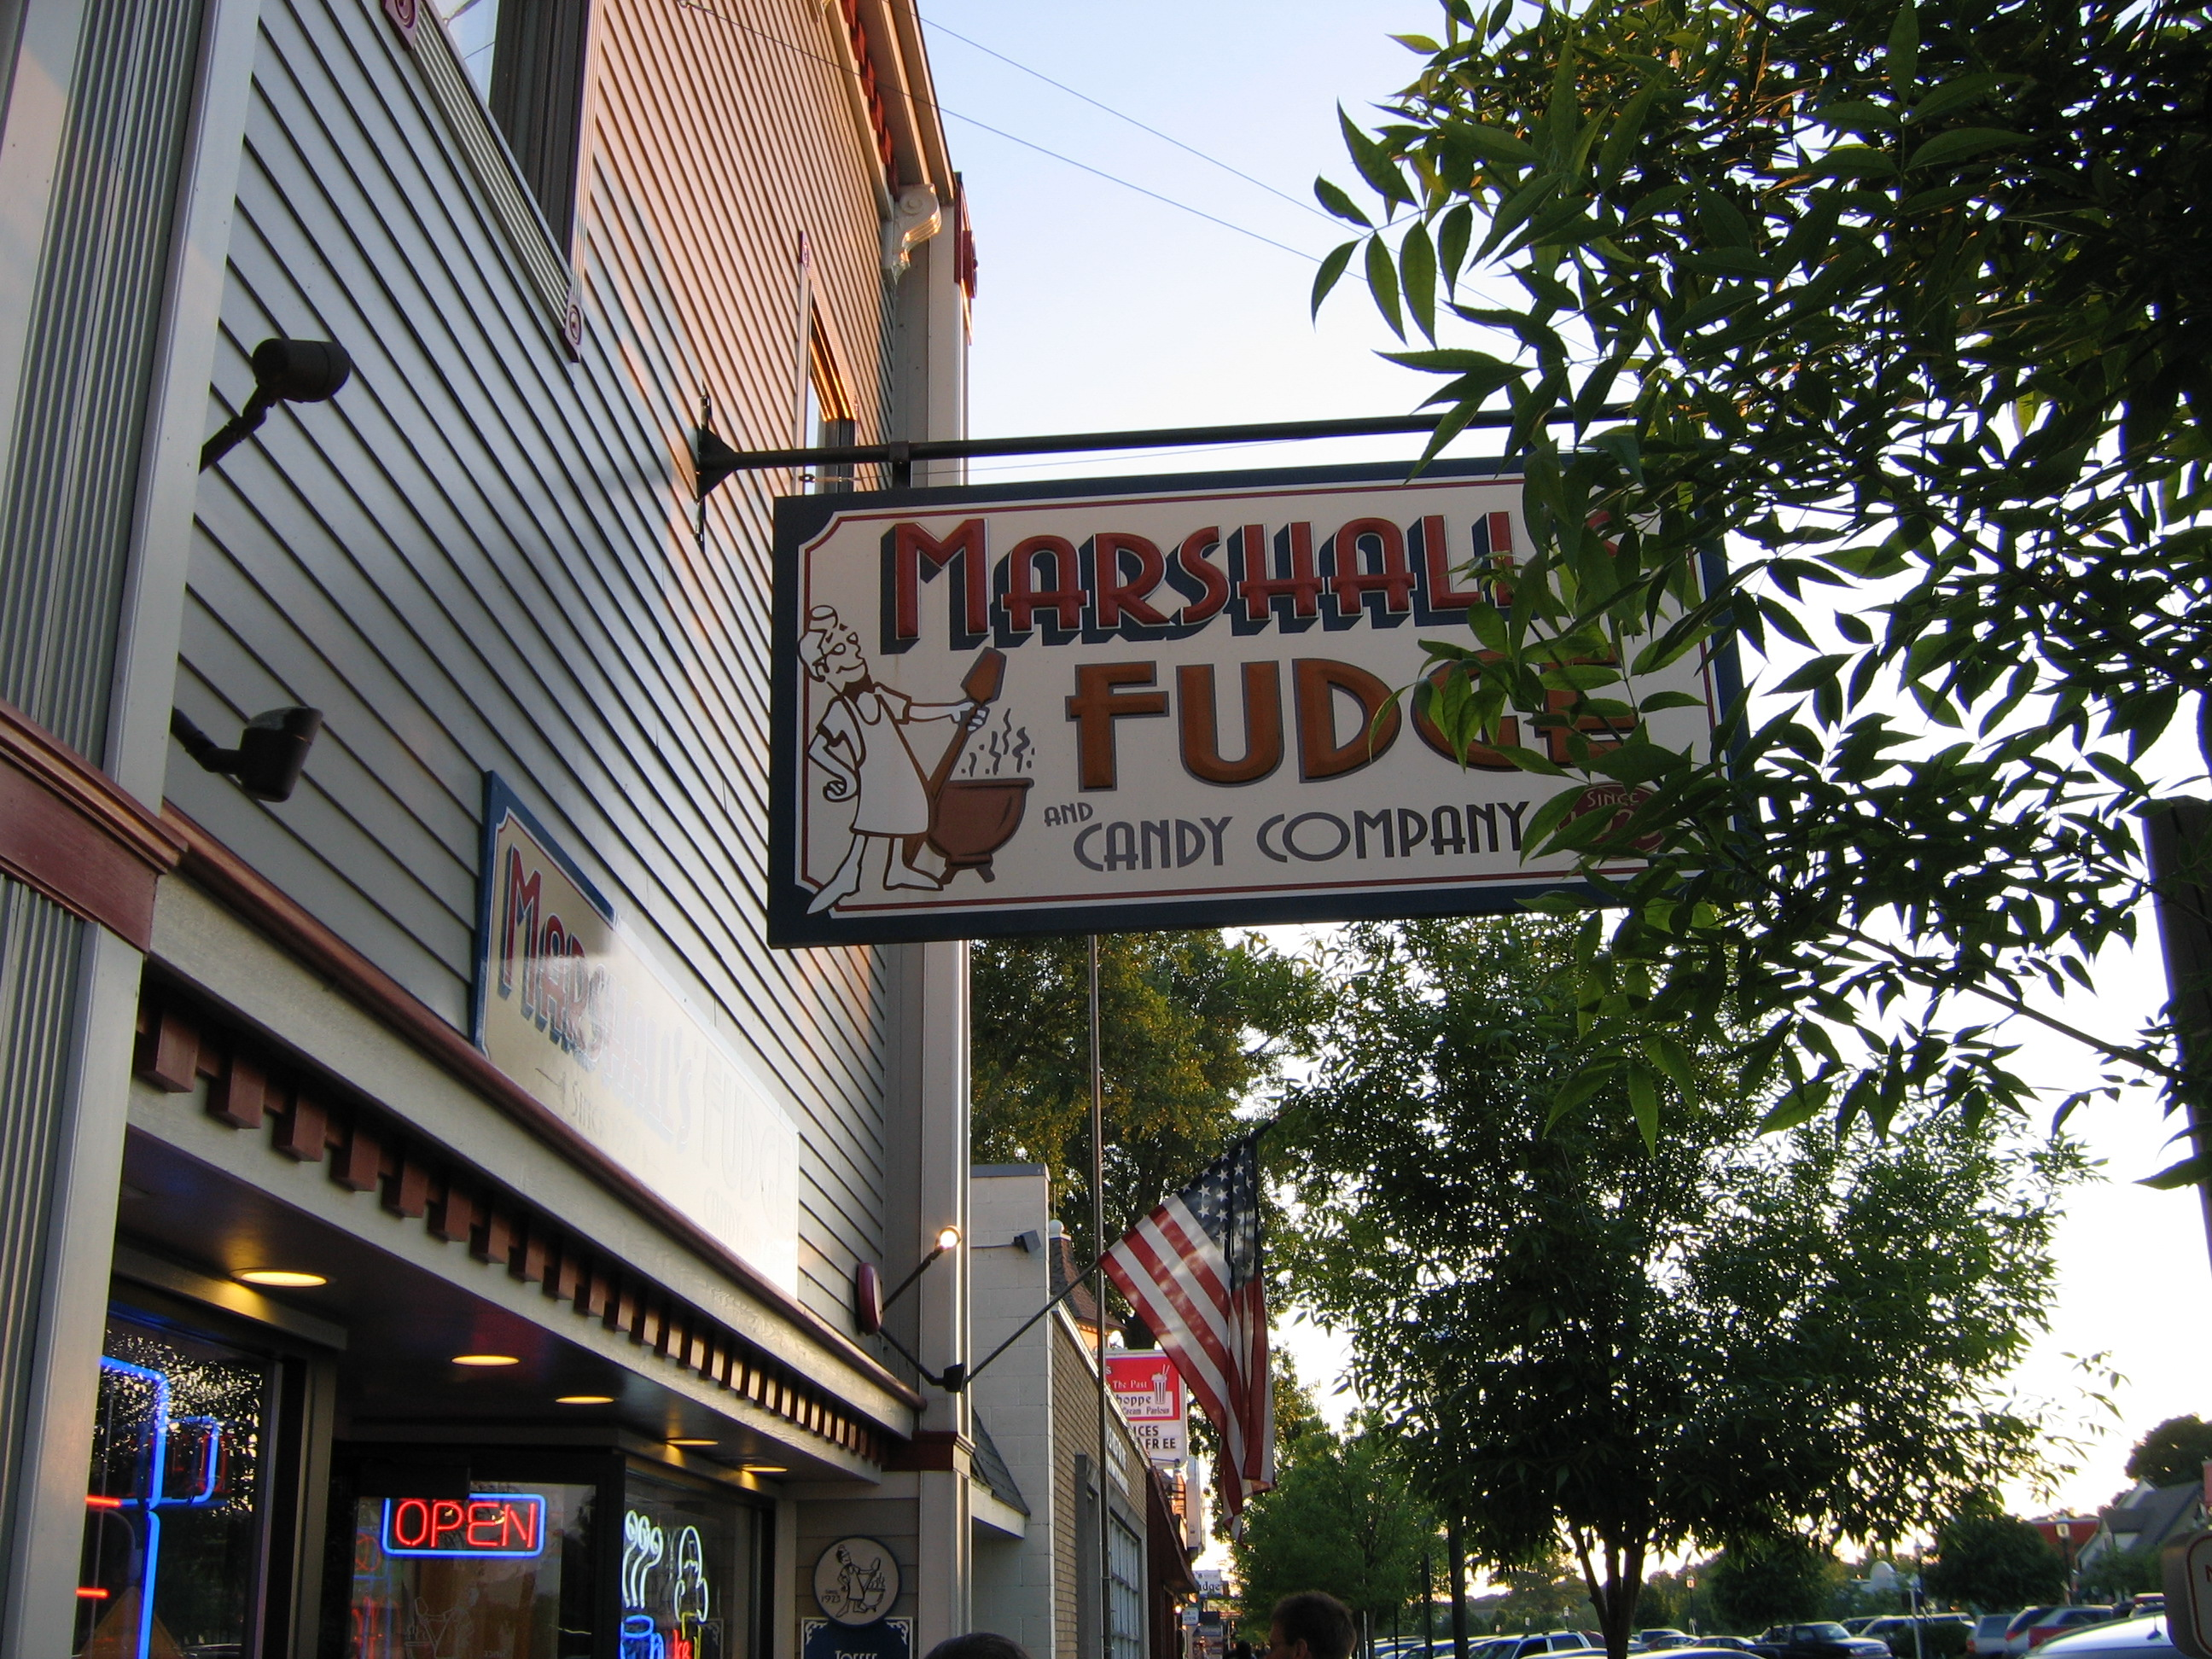 Marshall's Fudge